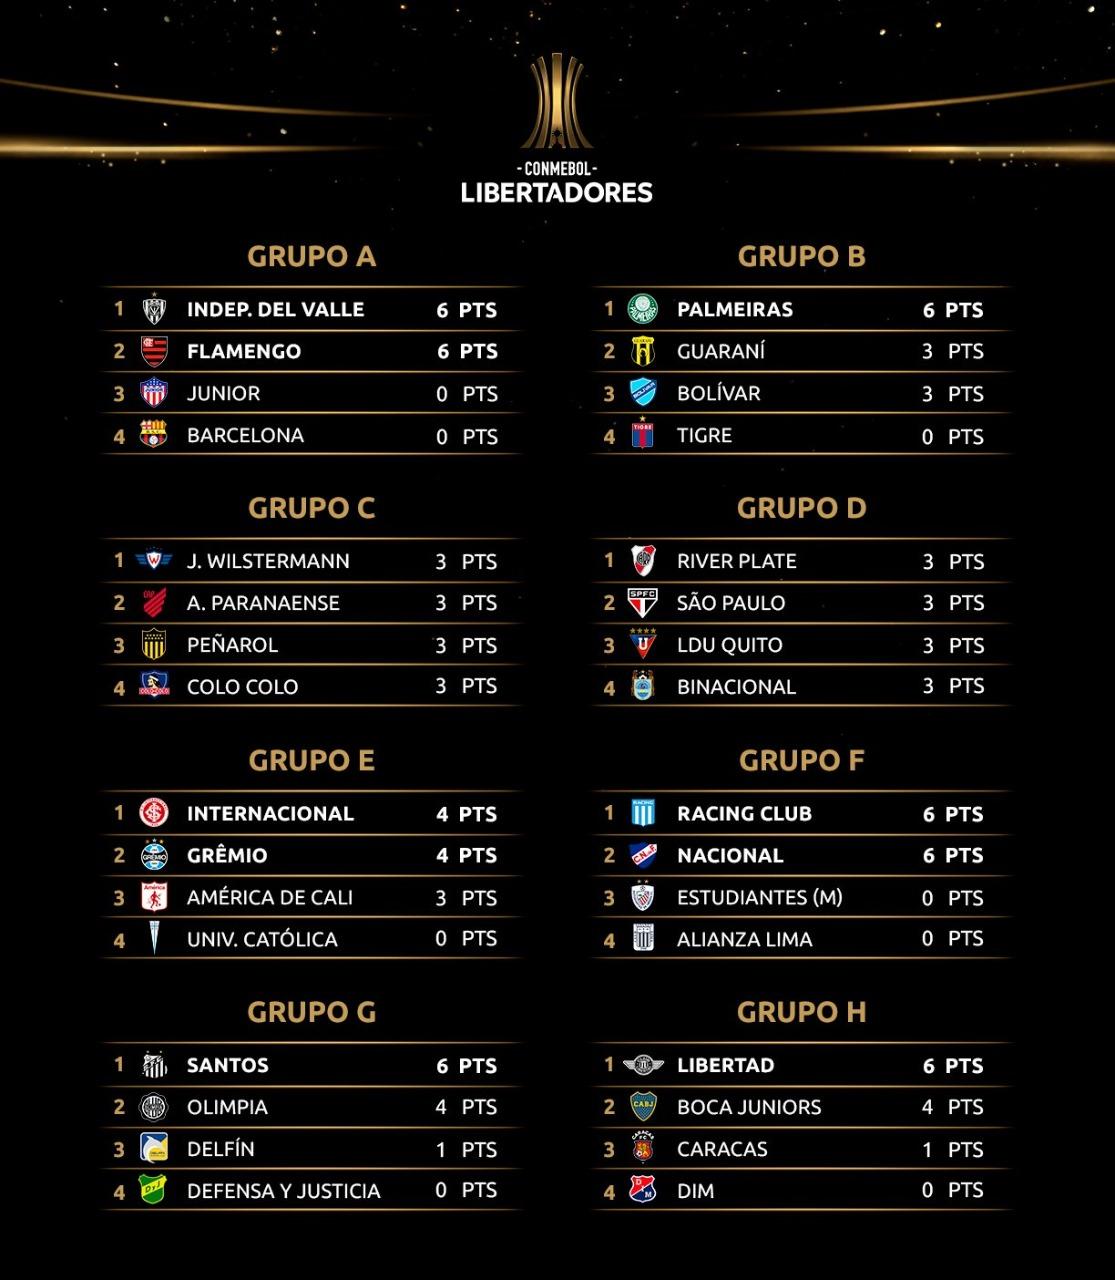 Posiciones Libertadores 2020